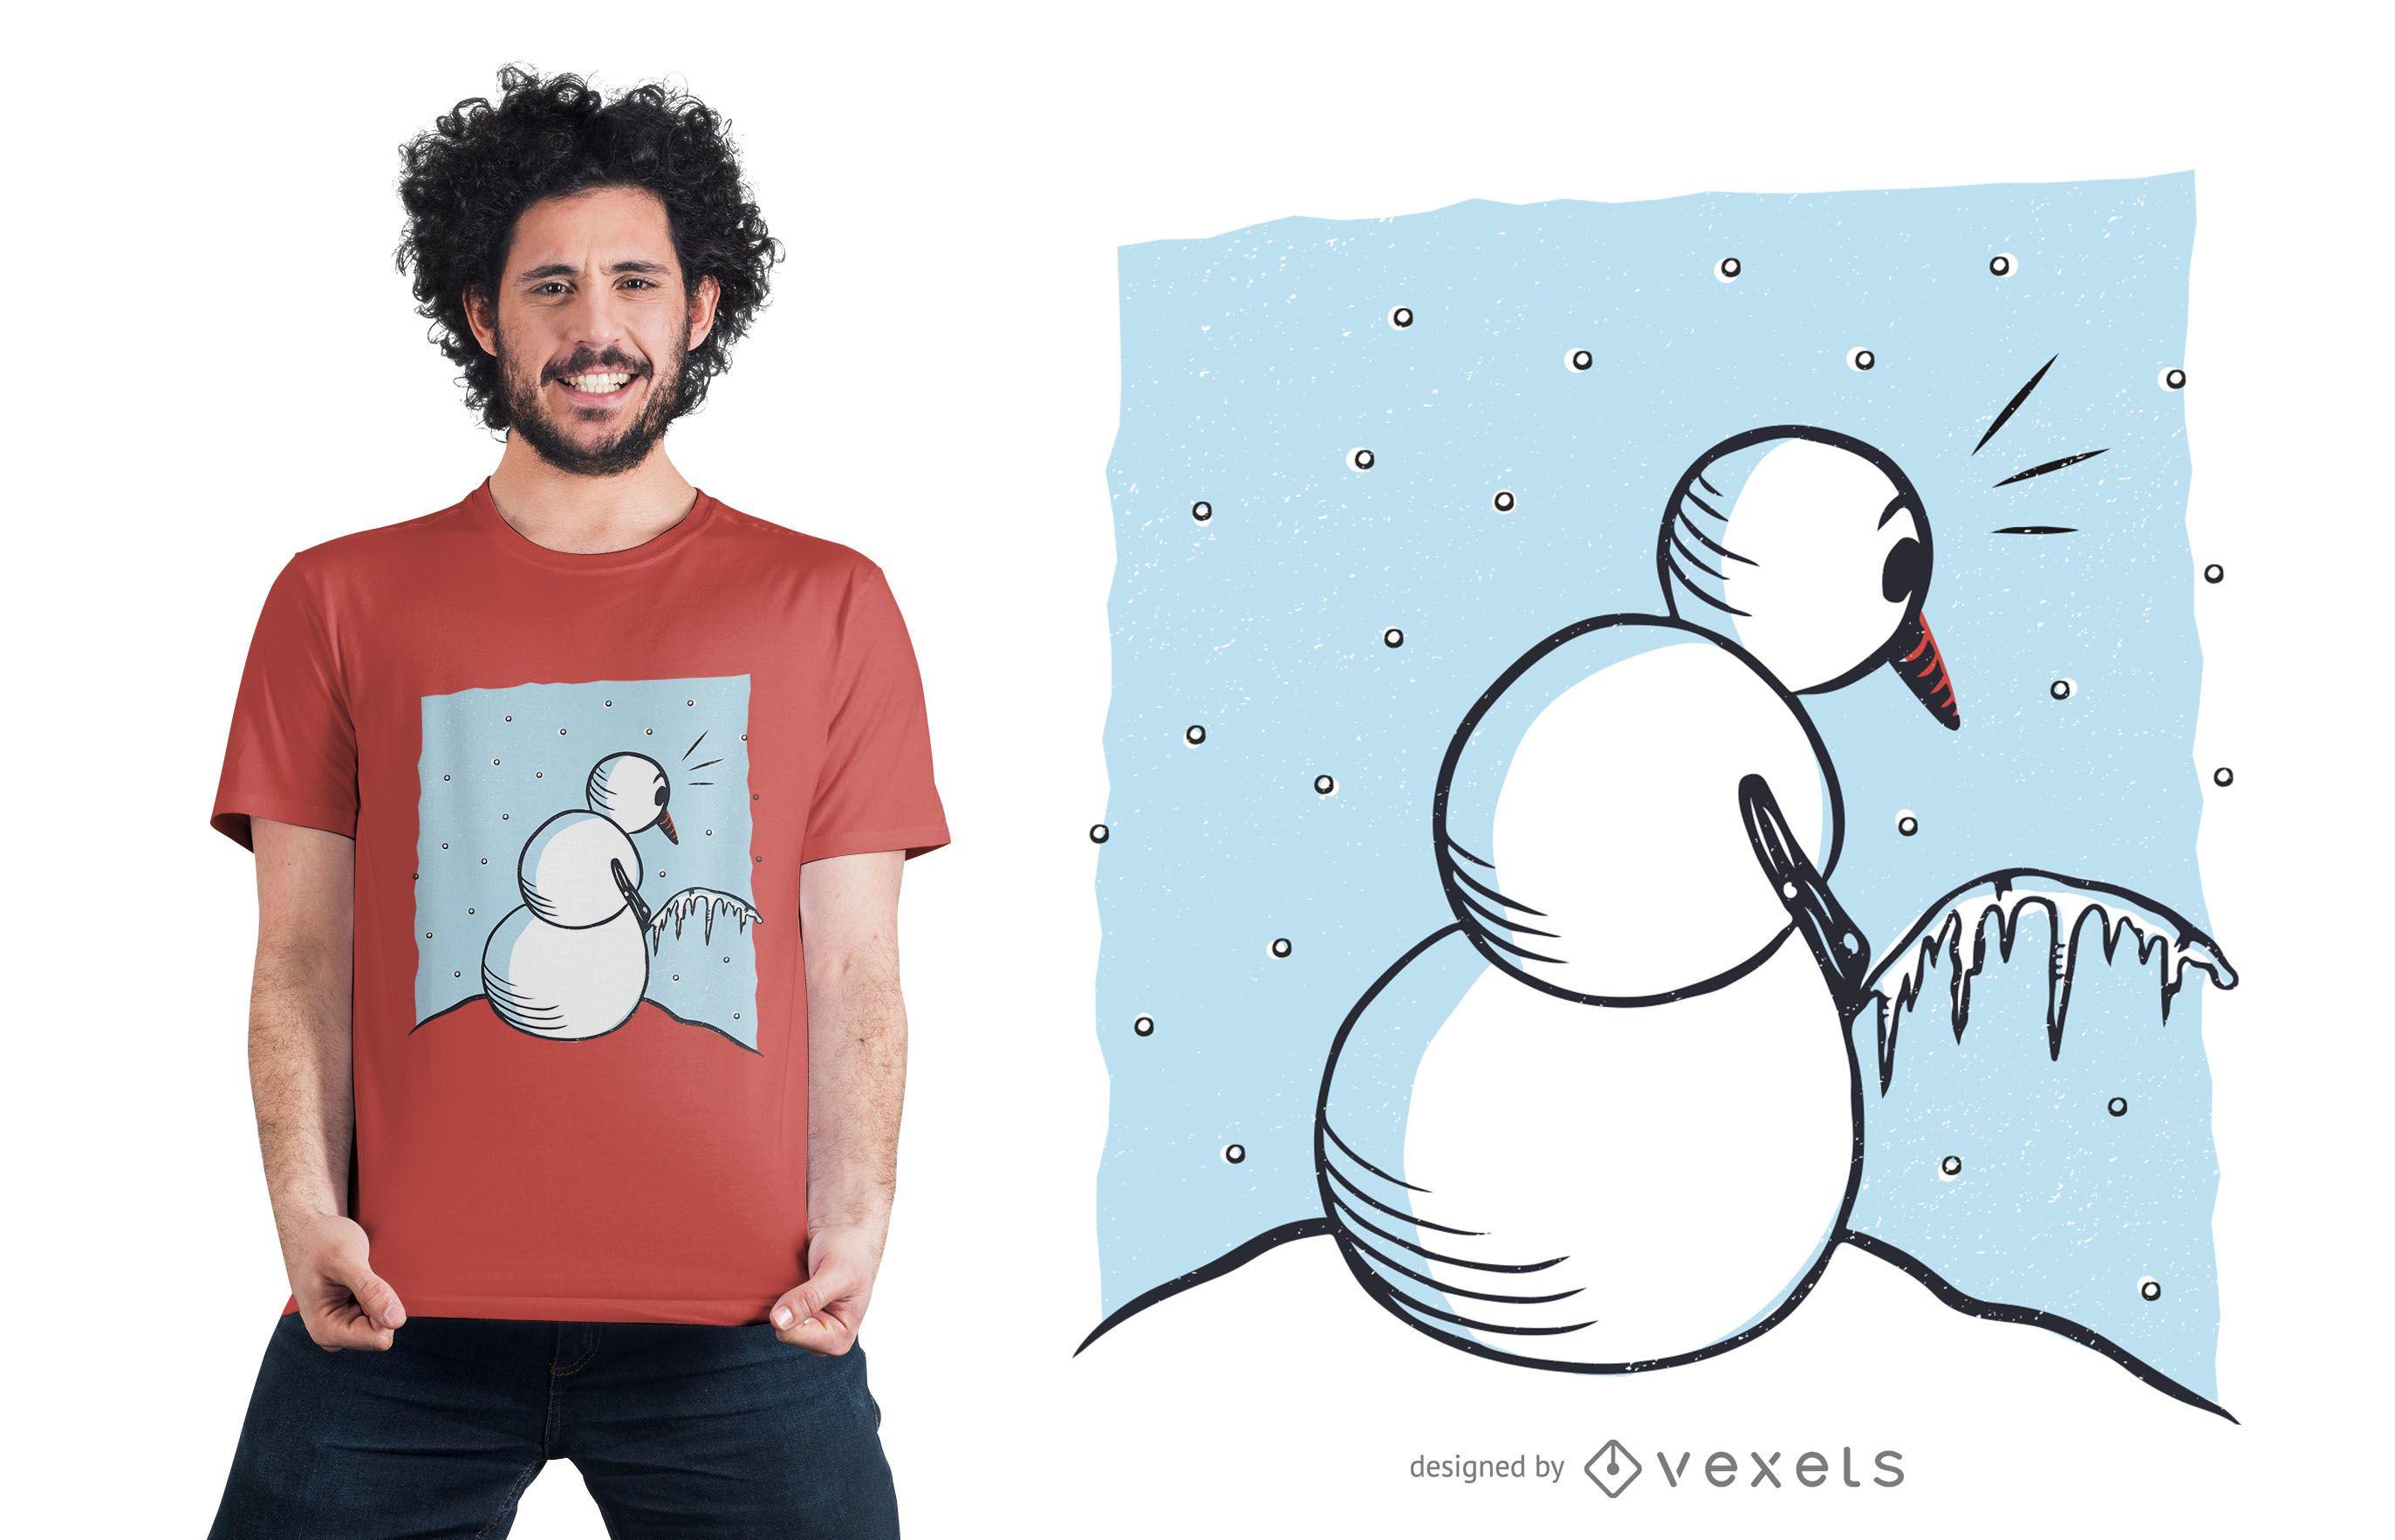 Dise?o de camiseta divertida de mu?eco de nieve orinando